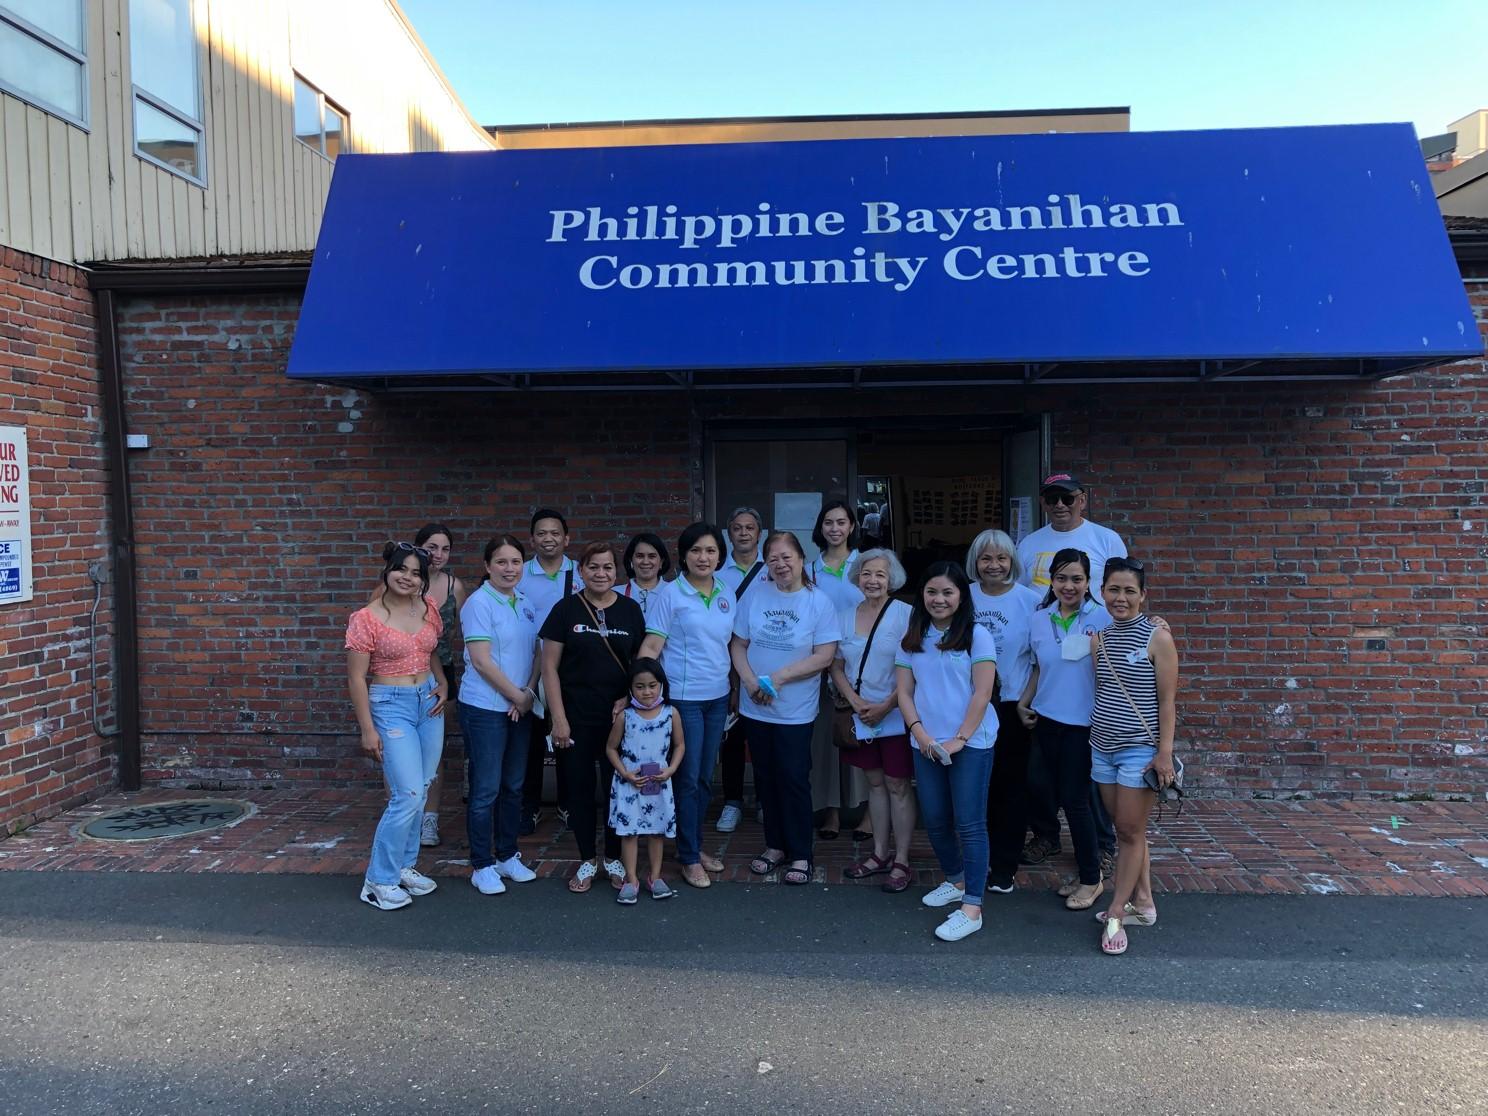 Philippine Consulate General in Vancouver Brings Consular Services  to Victoria, British Columbia